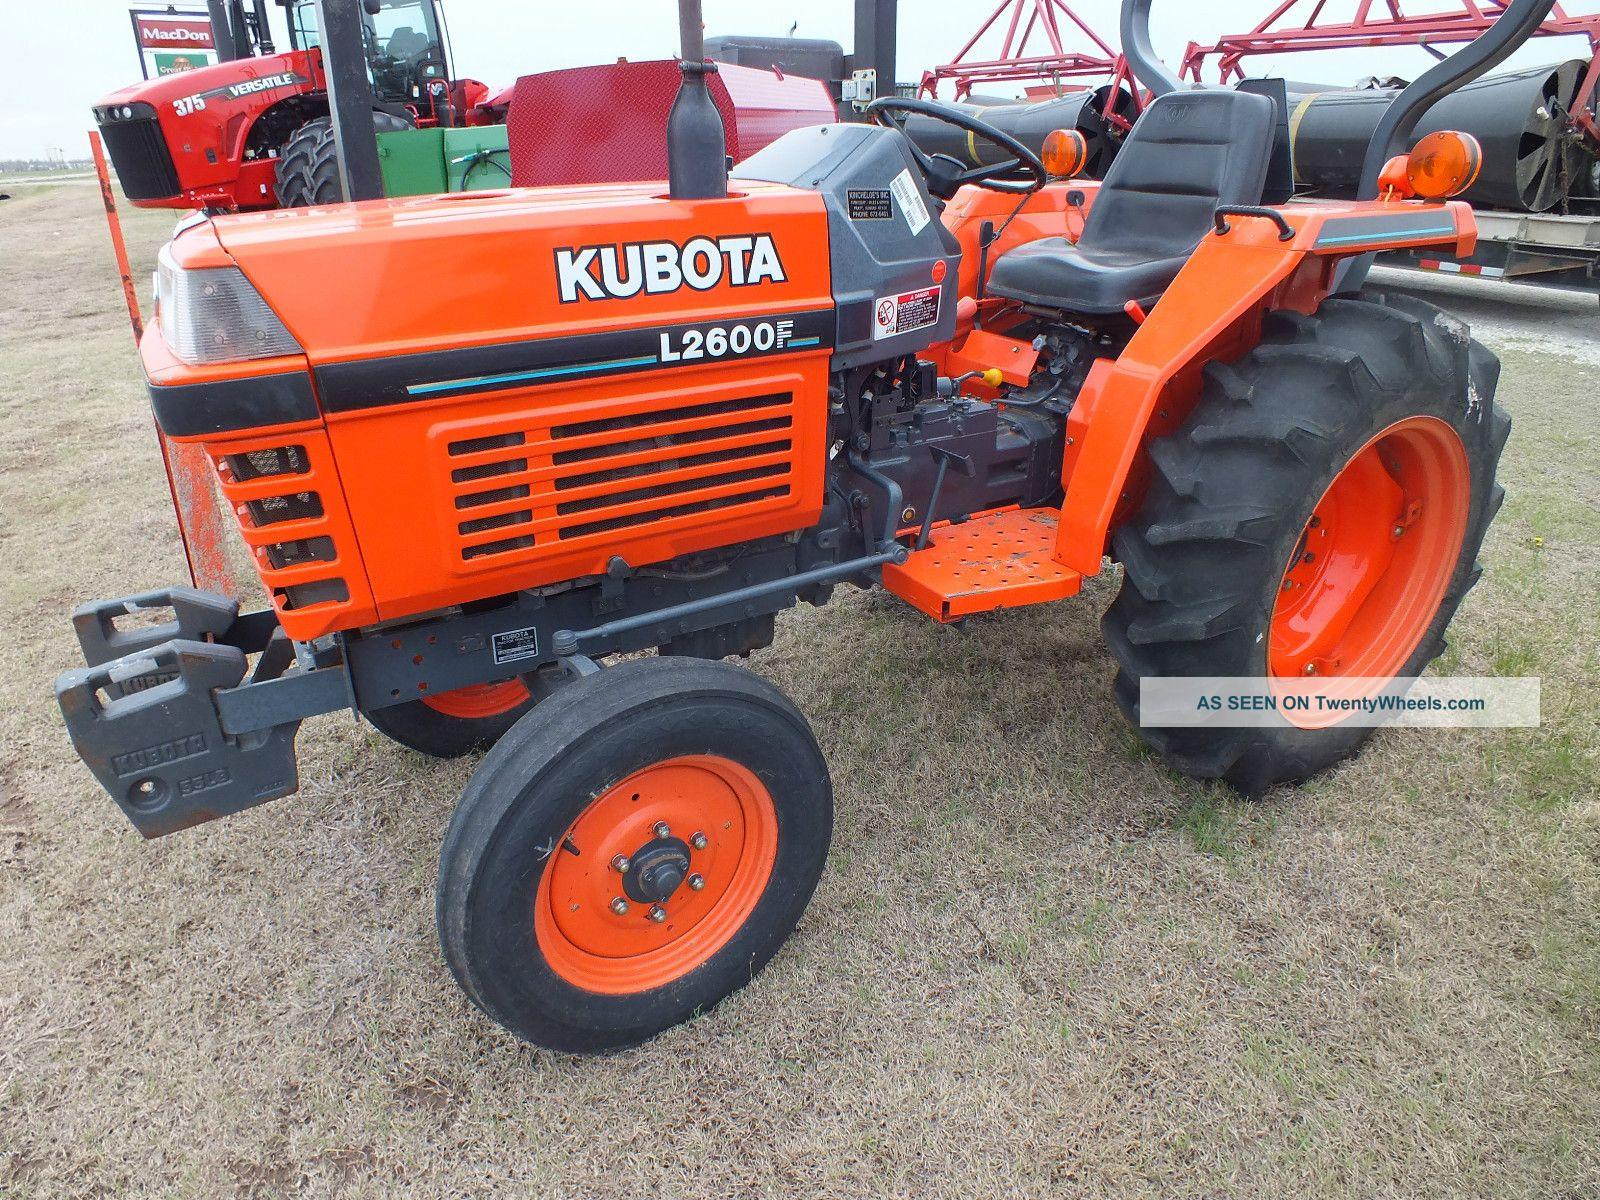 2001 Kubota L2600f Tractors photo